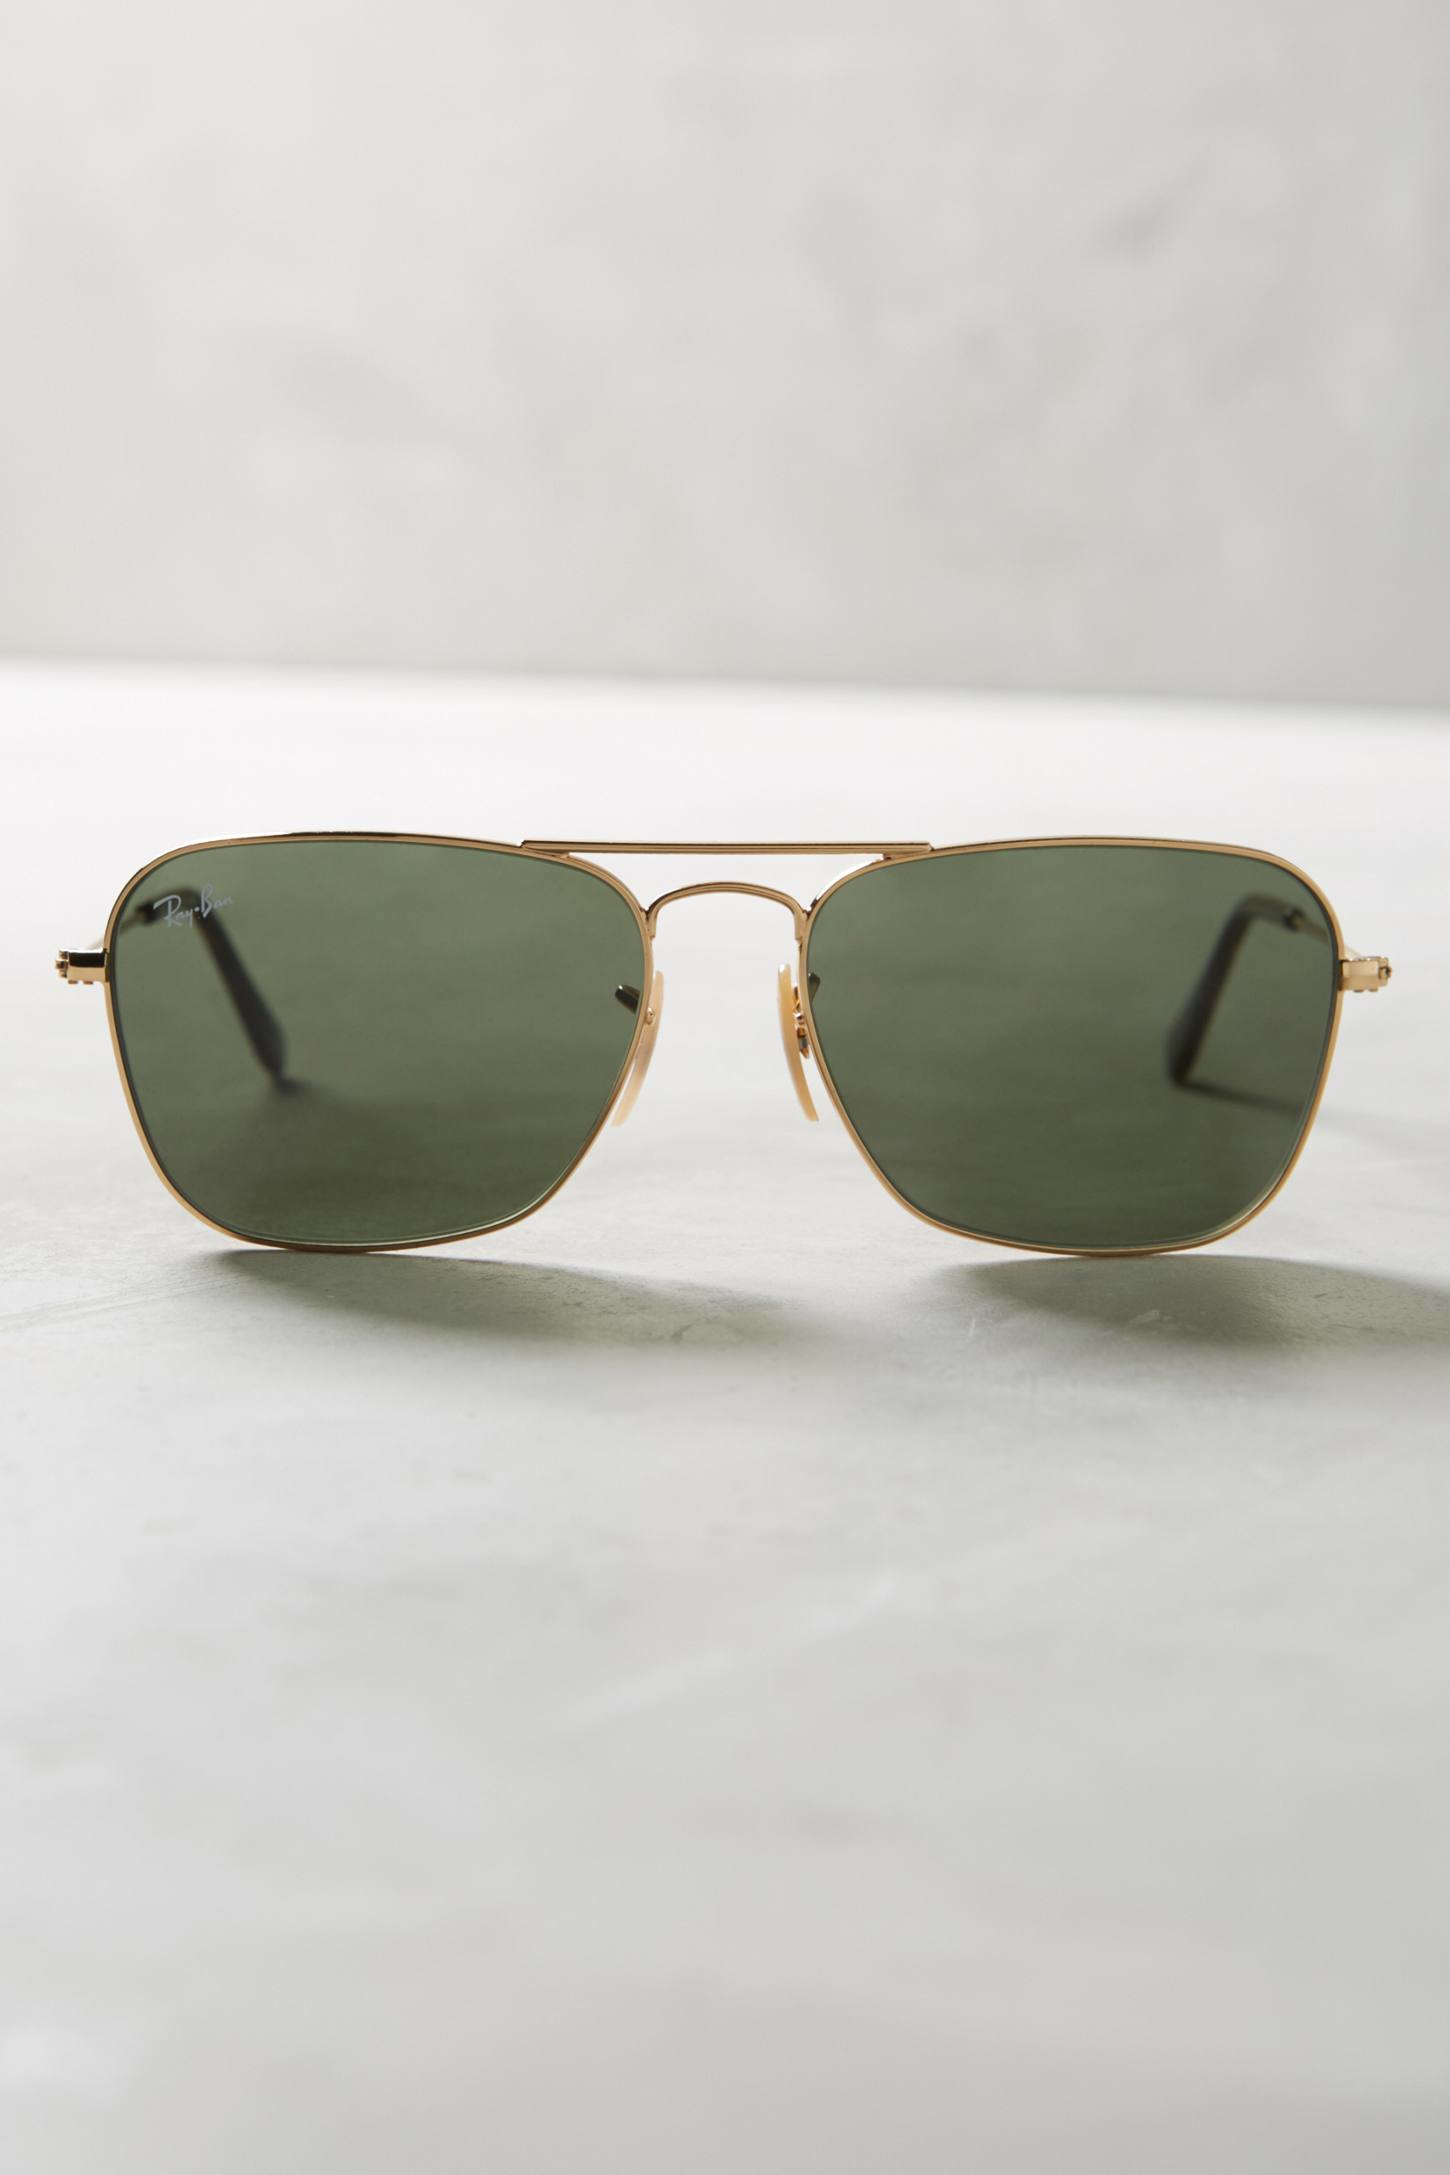 Ray-ban Caravan Havana Sunglasses in Green